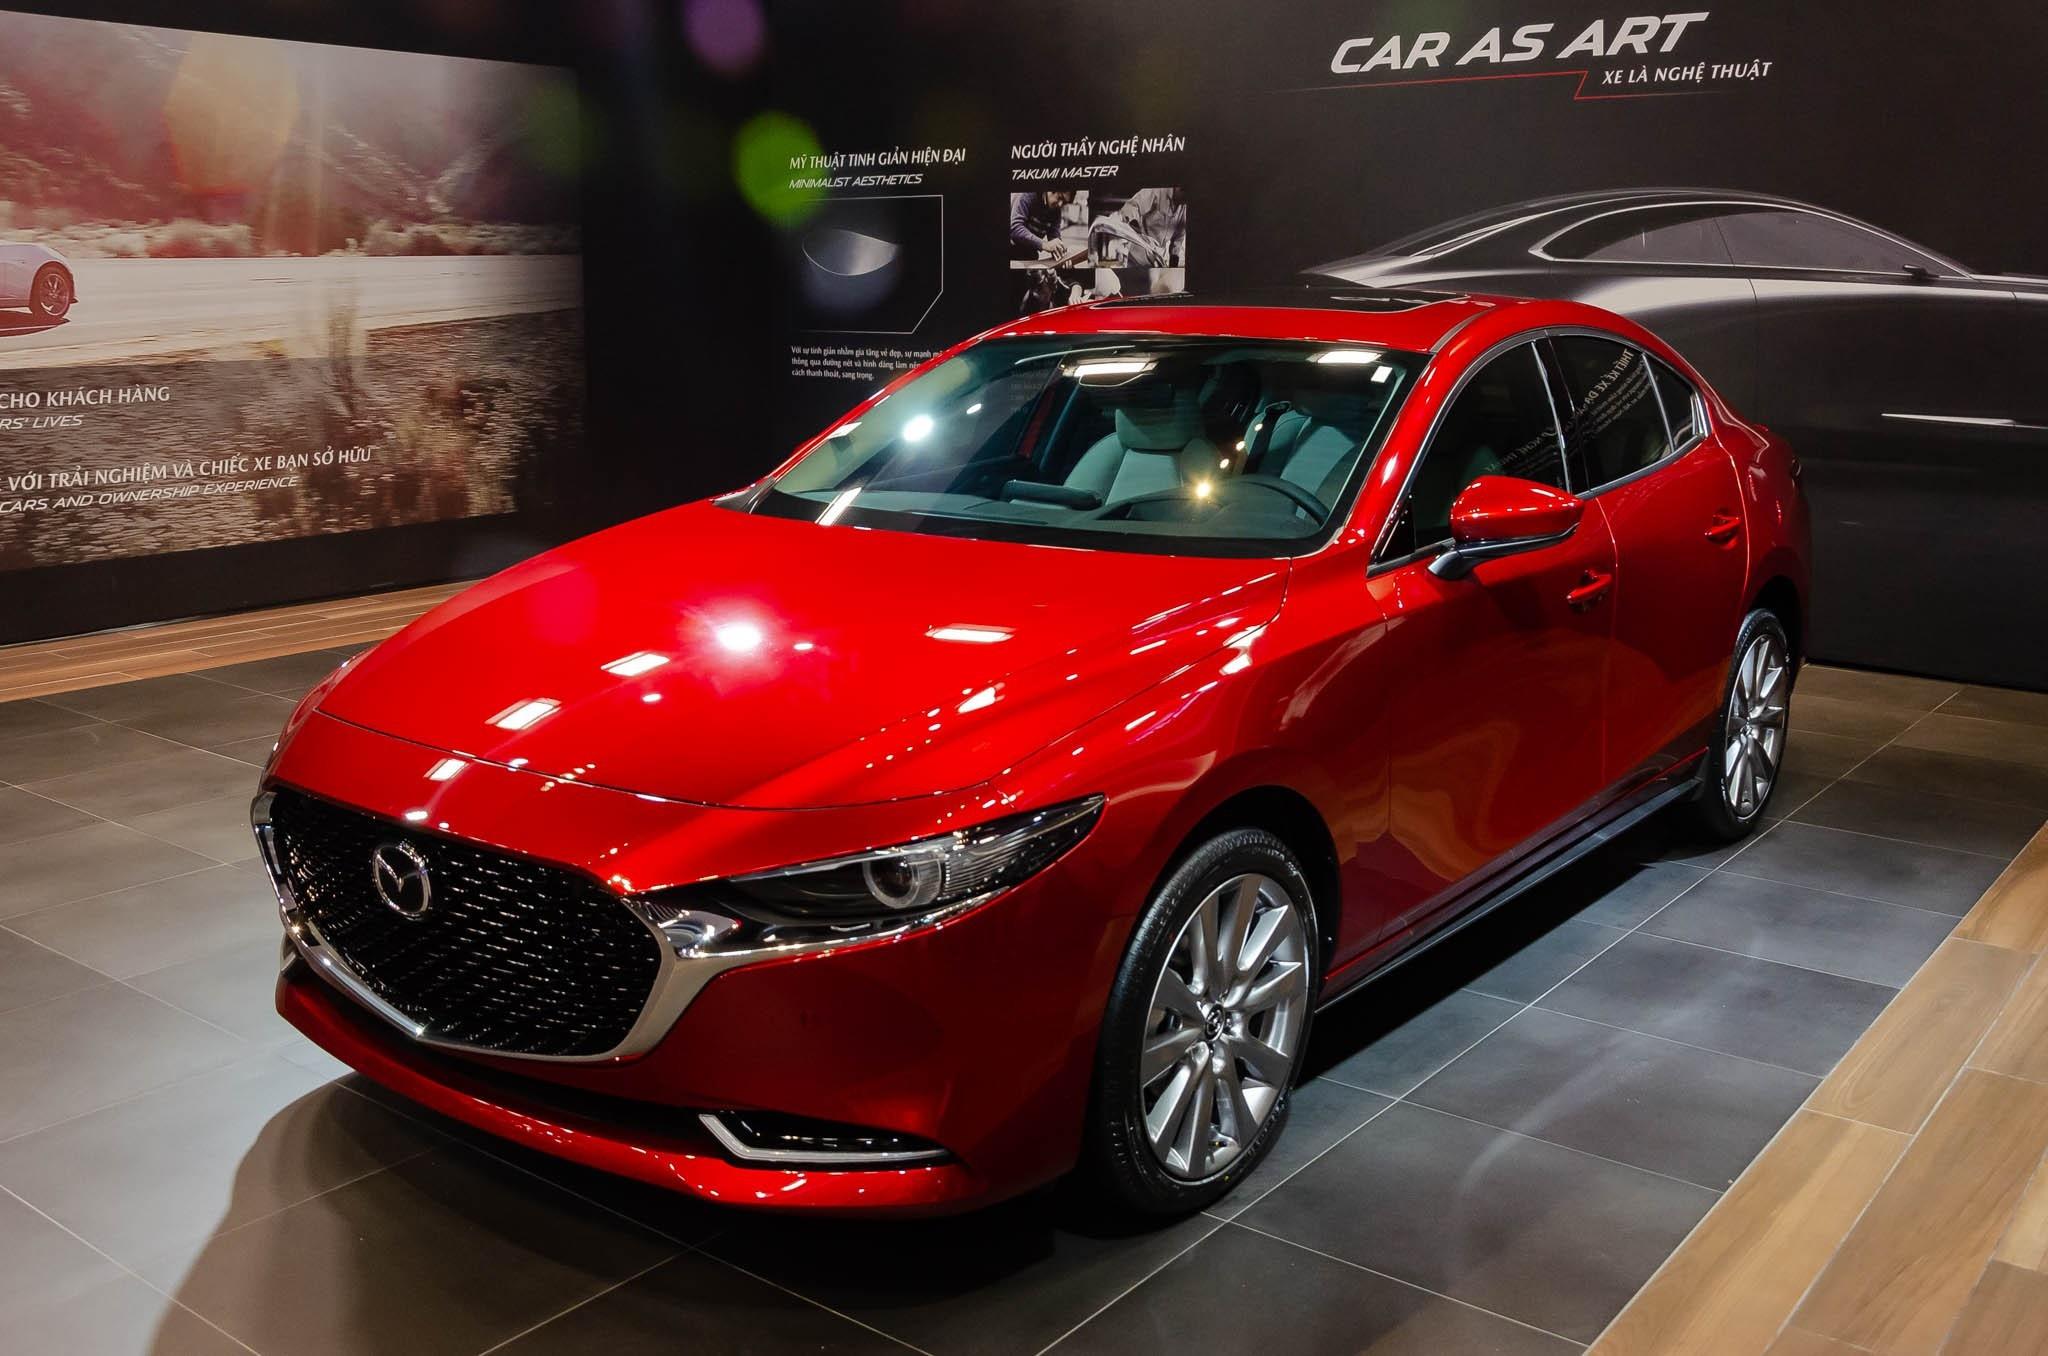 Vios van ban chay nhat Viet Nam du Xpander bam phia sau hinh anh 5 Mazda3_2020_1_Zing_1.jpg